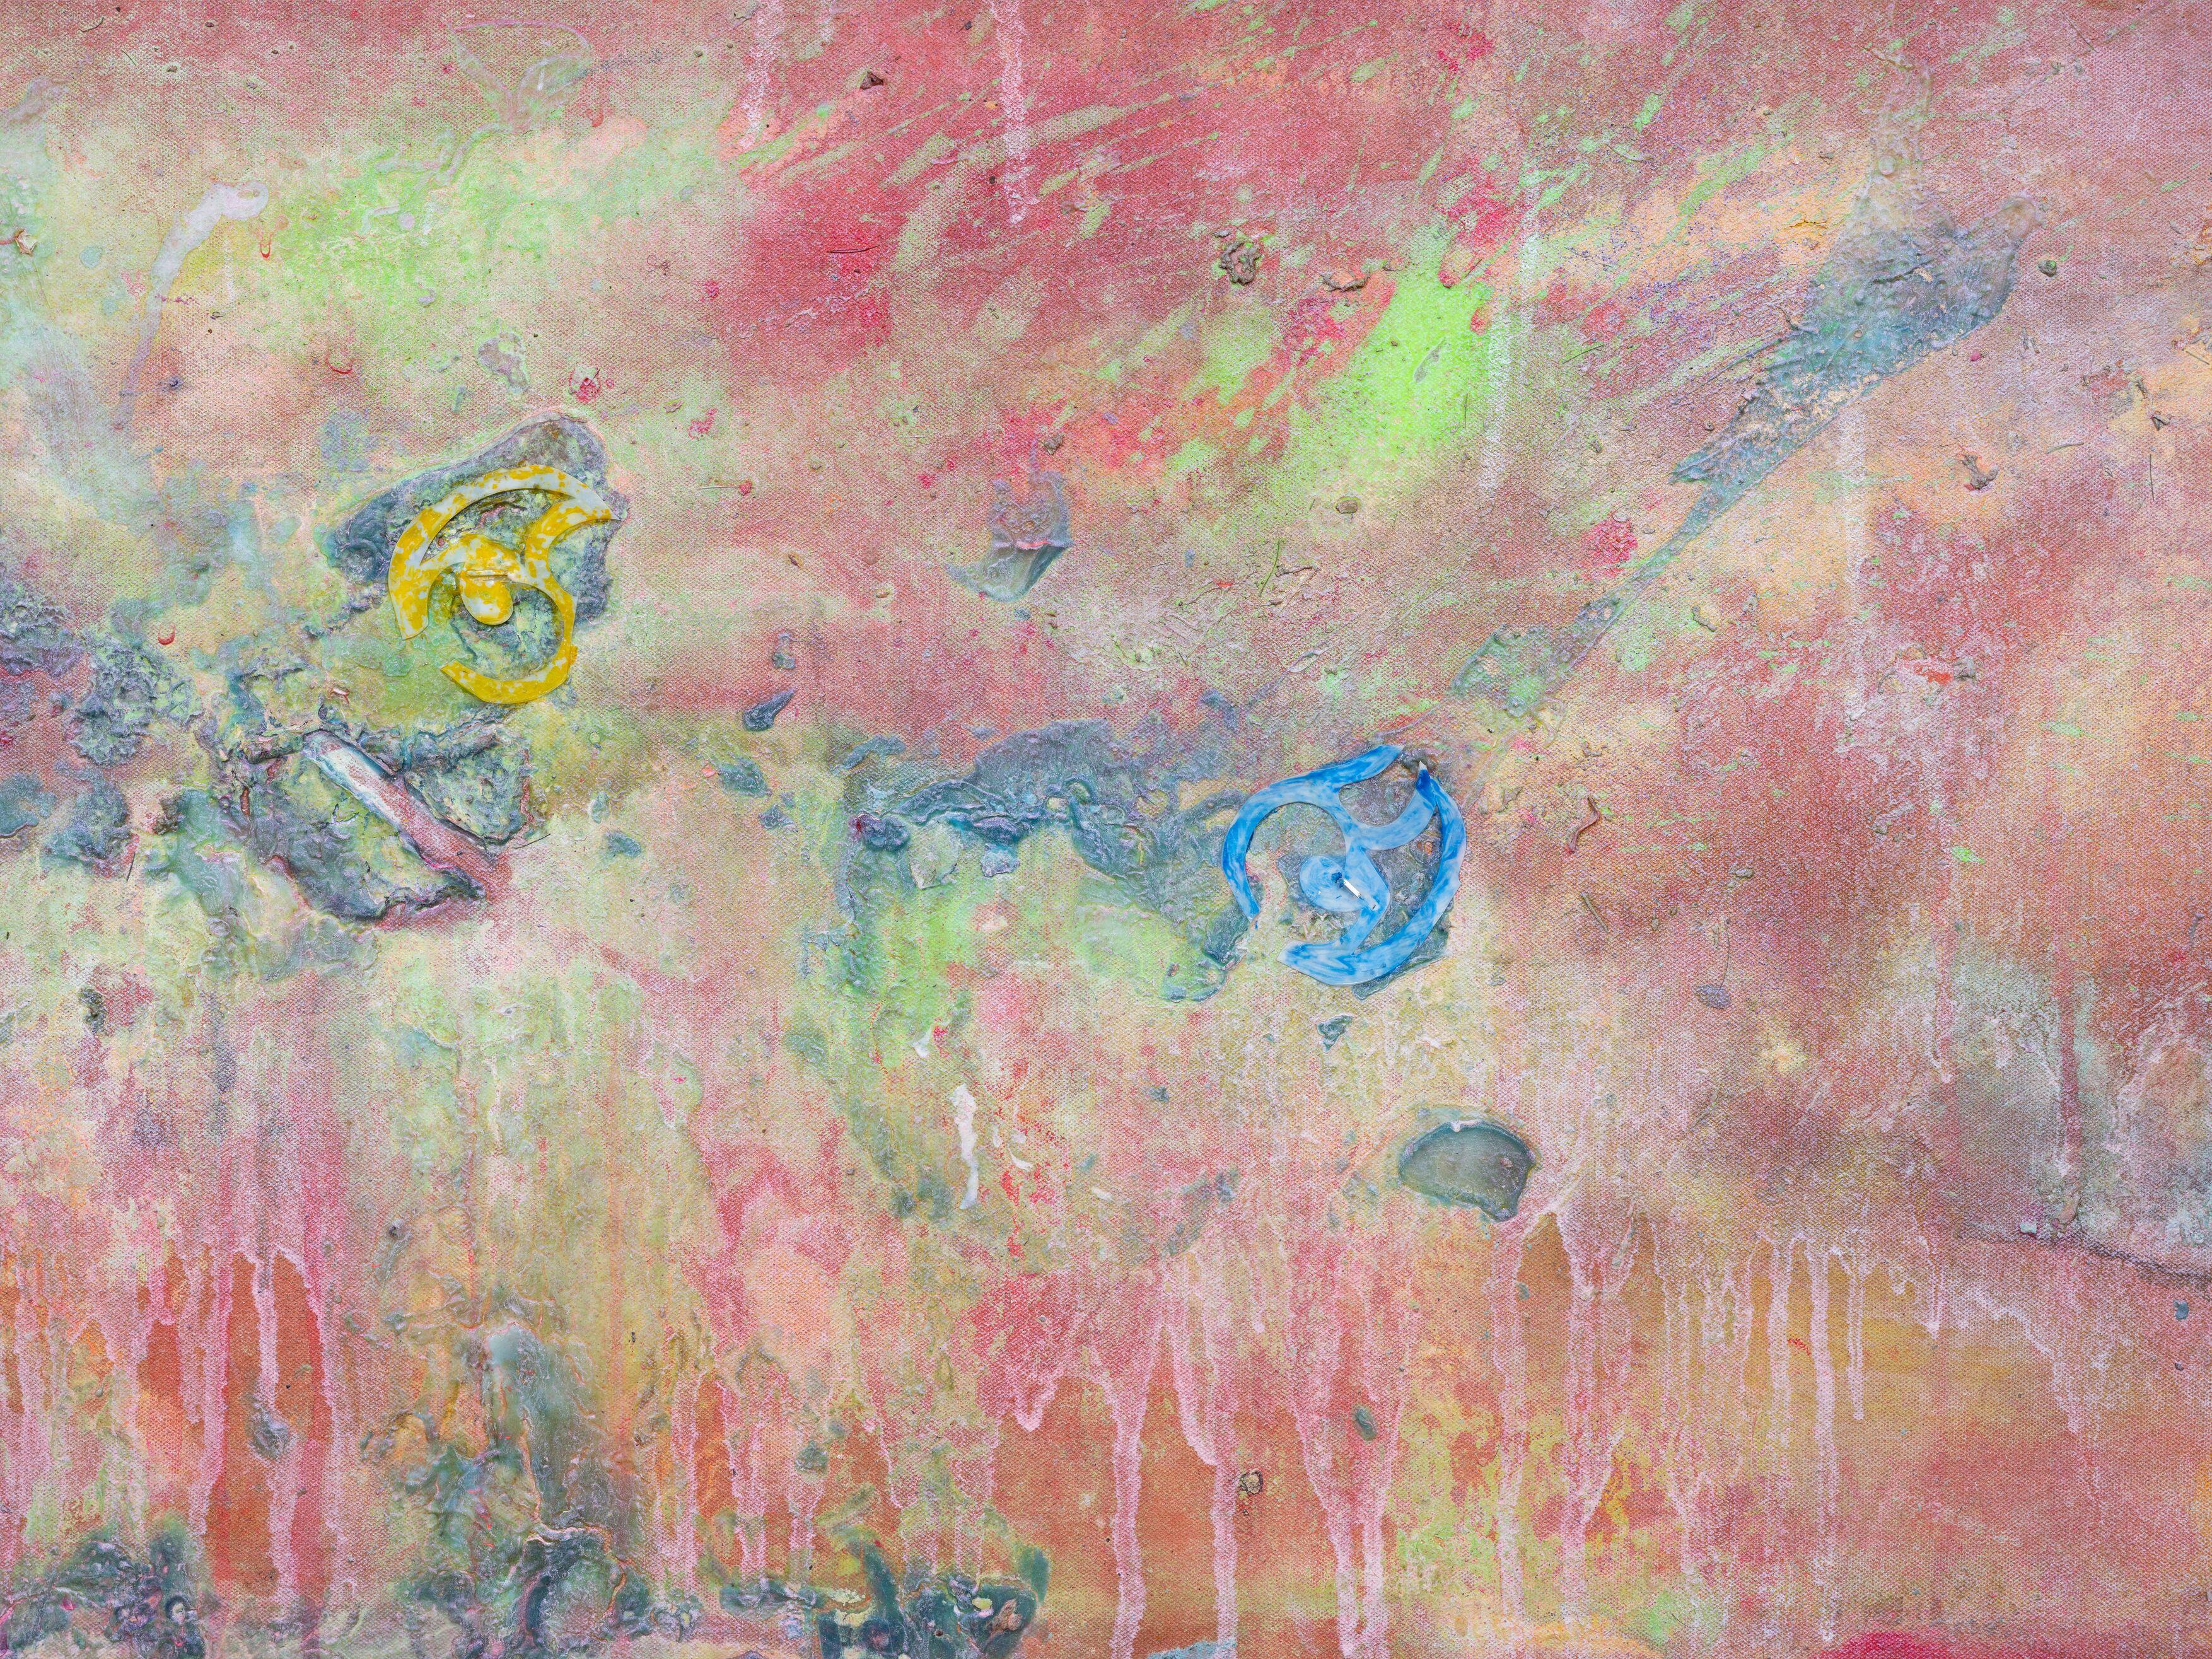 Frank Bowling, Jetty 1983 Acrylic, acrylic gel and polyurethane foam on canvas 181 x 252 cm, Frank Bowling – London / New York, Hauser & Wirth, 21 May - 31 July 2021.Photo: Alex Delfanne, Courtesy the artist and Hauser & Wirth.